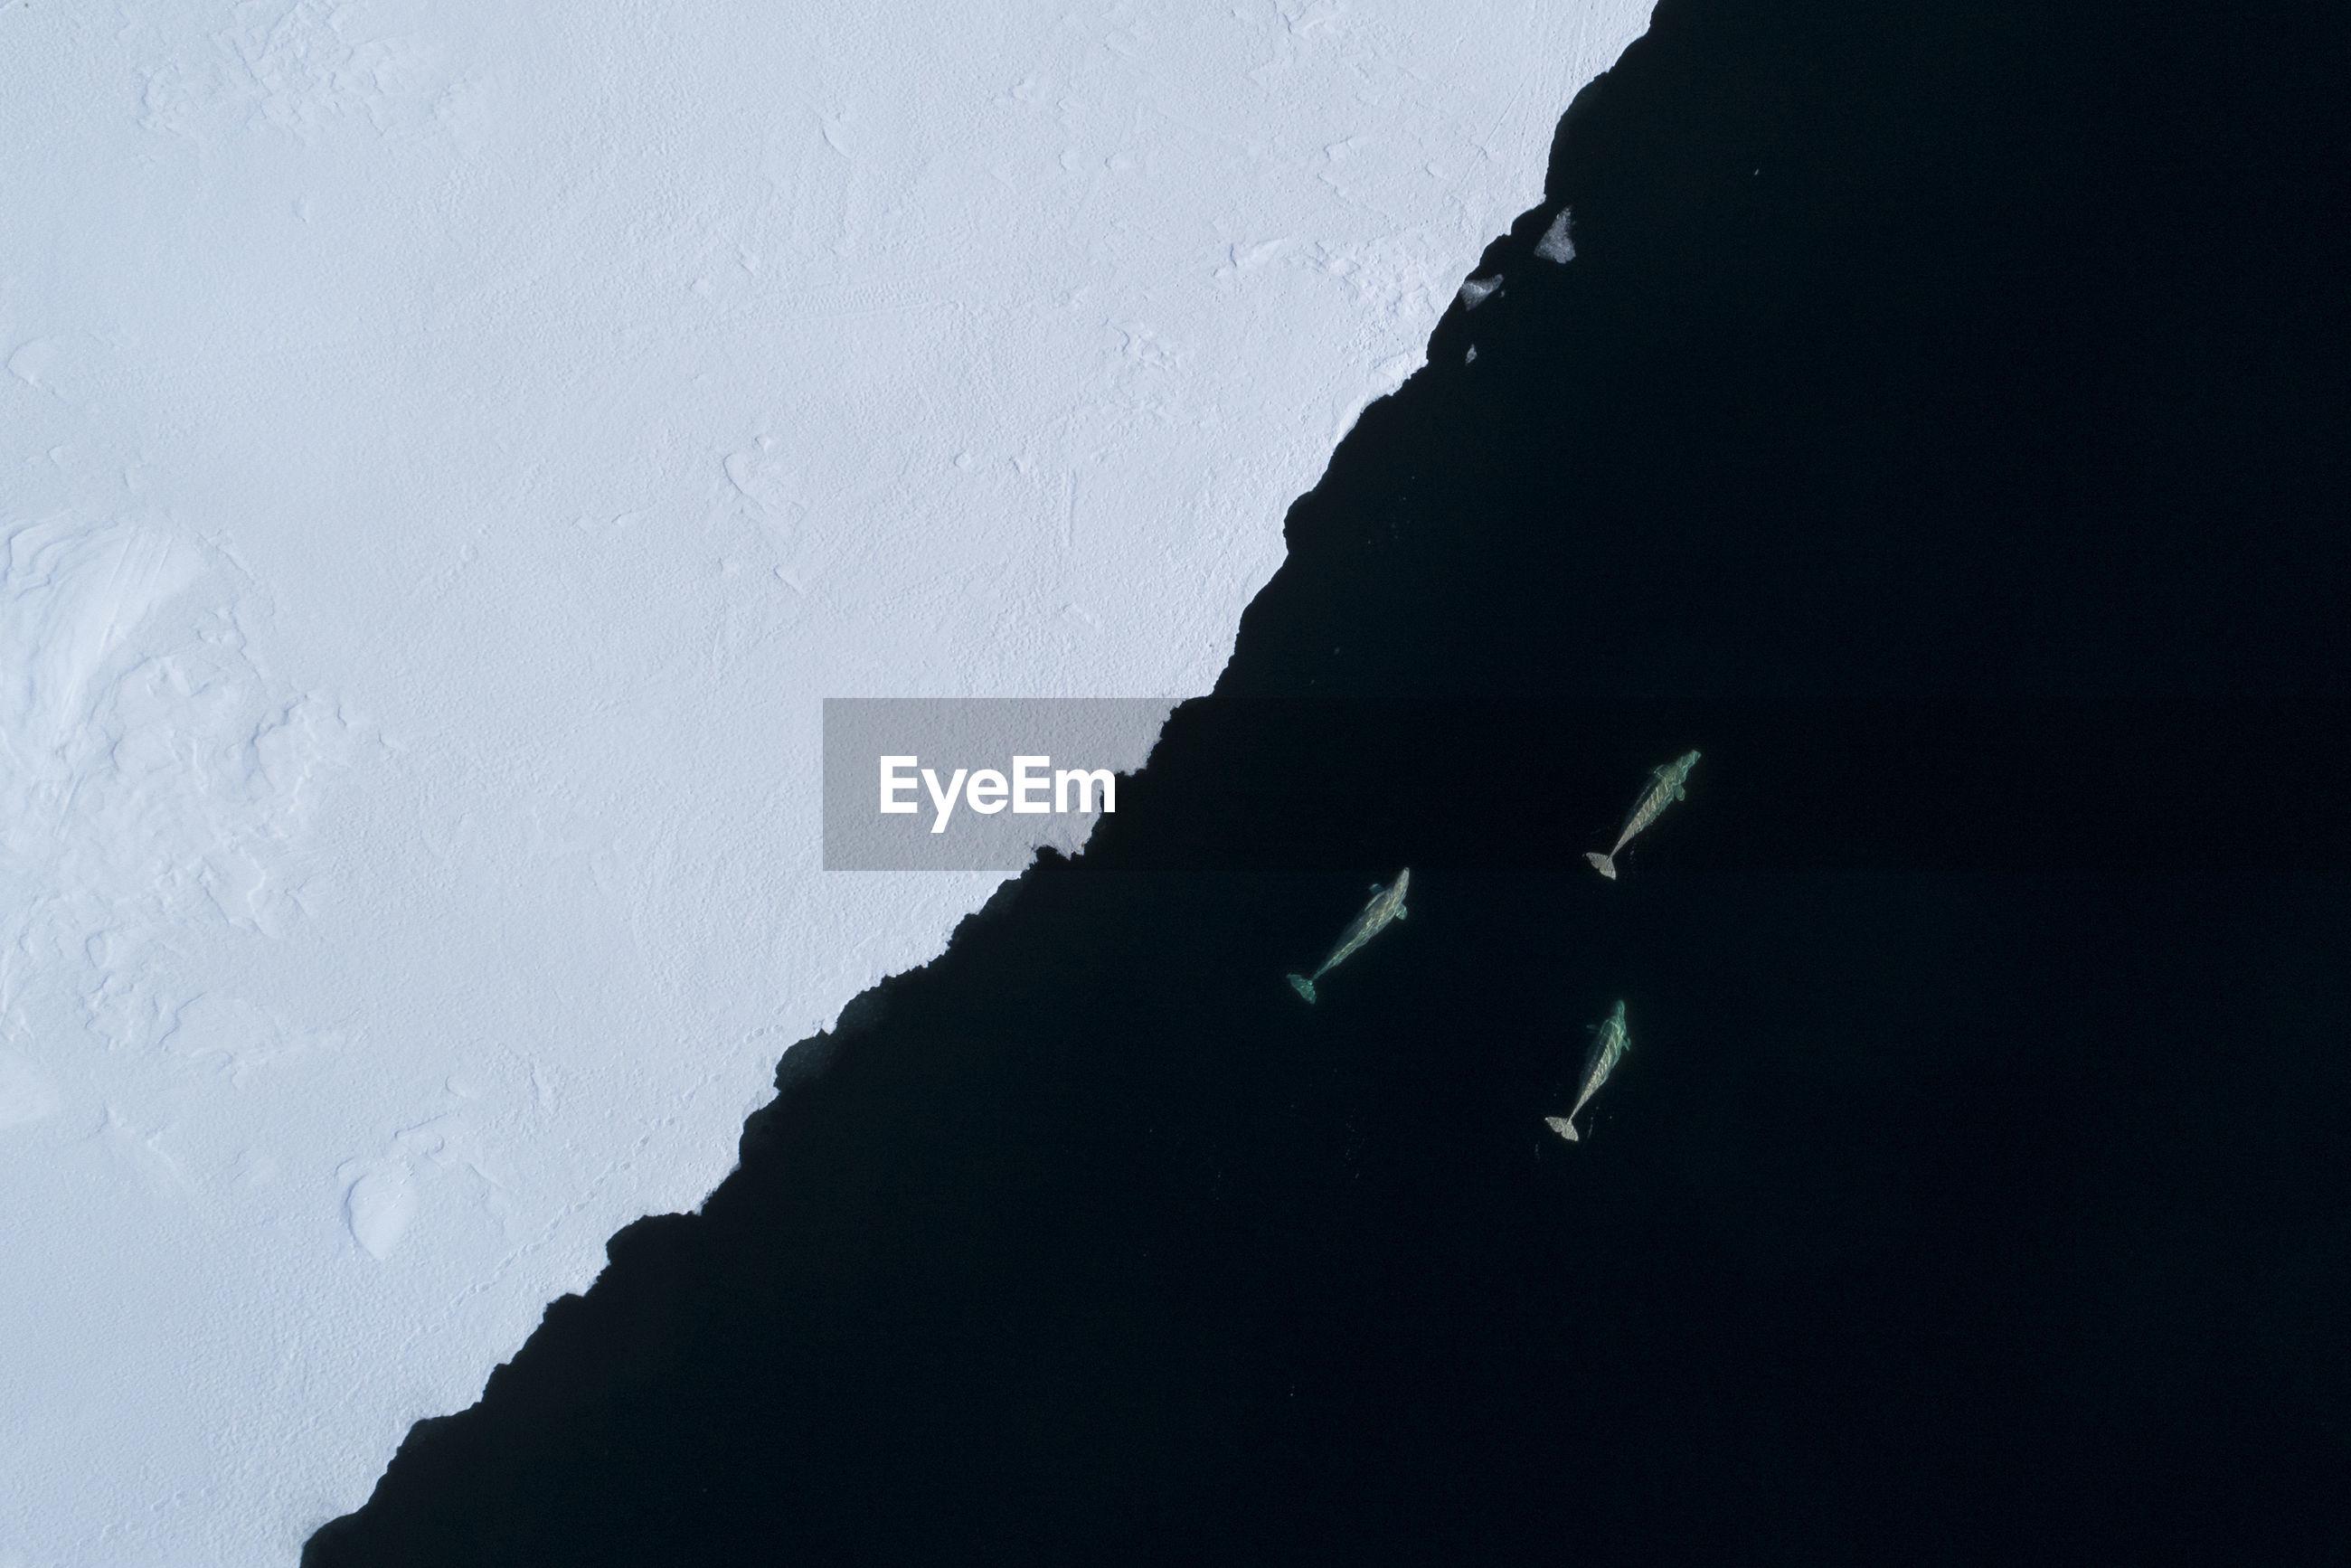 Beluga whales feeding at the ice edge on svalbard, the arctic.